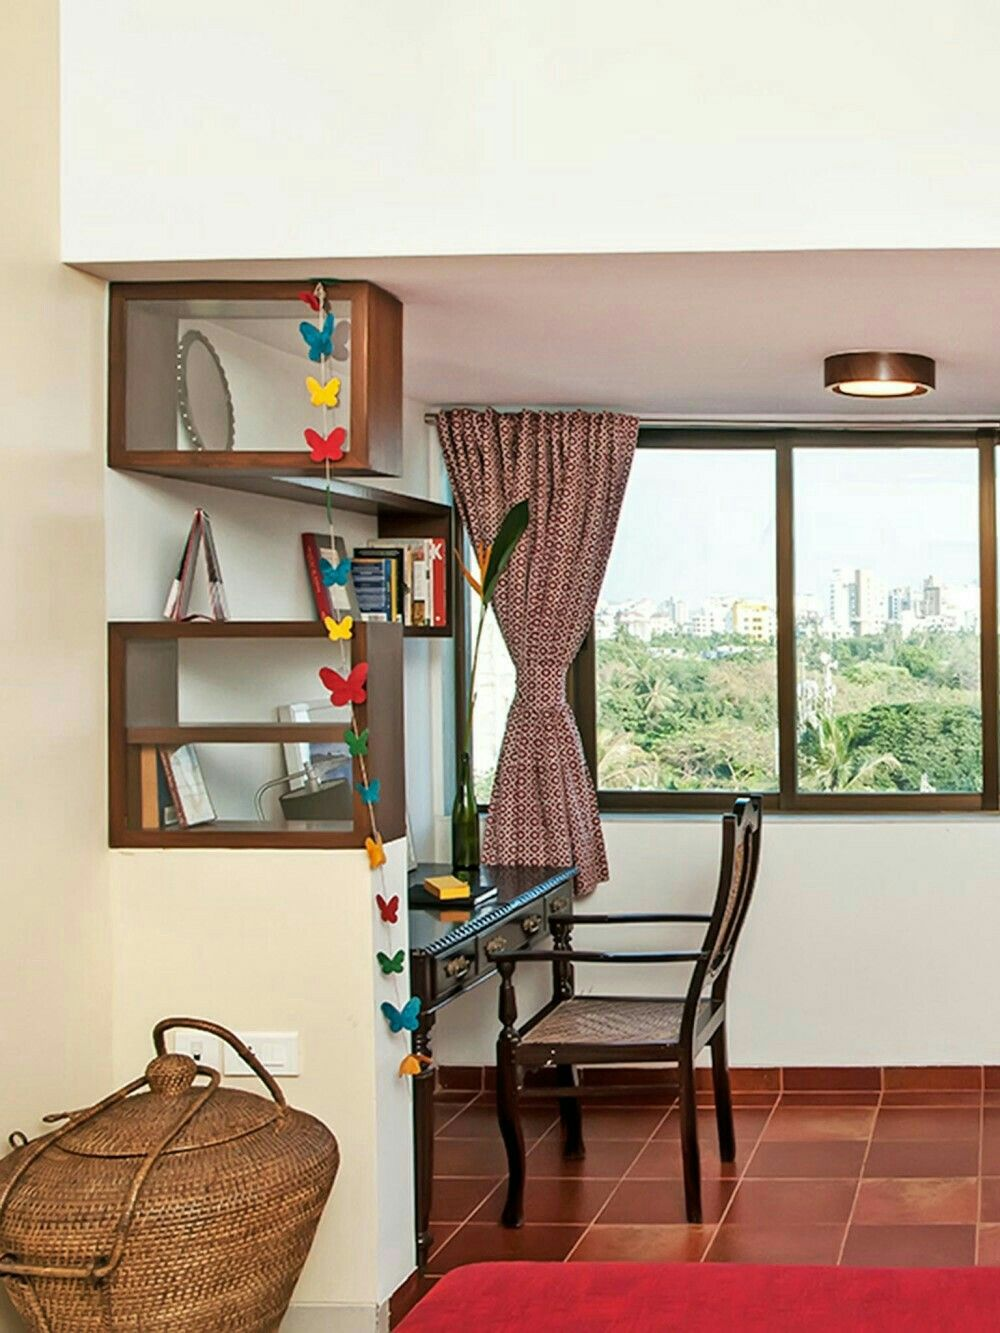 The best color scheme for flooring walls windows and furniture also rh ru pinterest